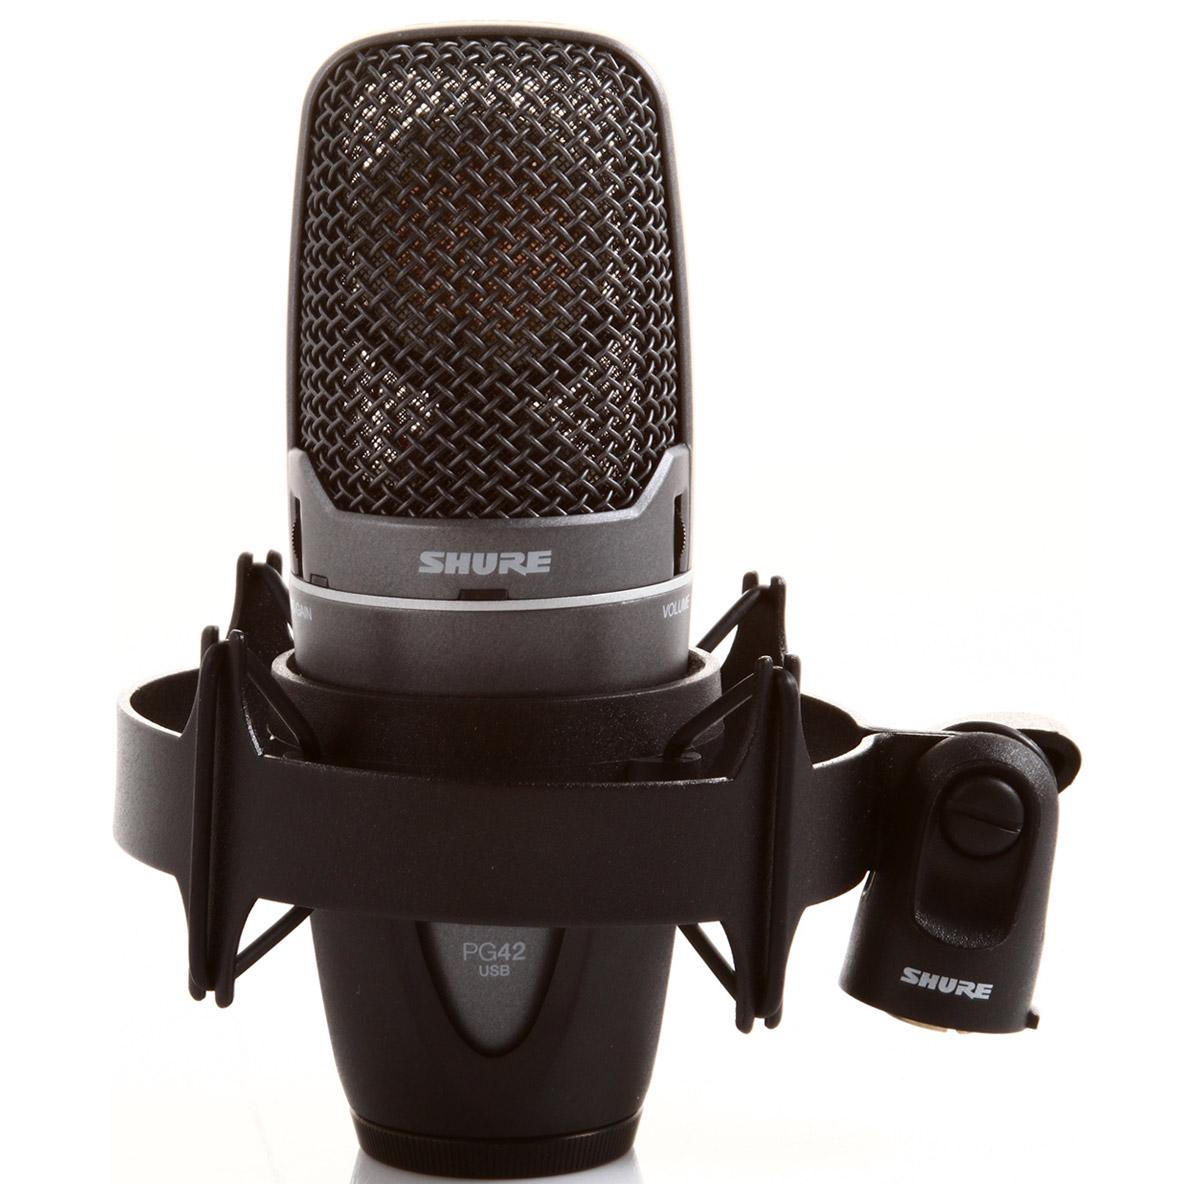 Microfone c/ Fio USB - PG 42 USB Shure